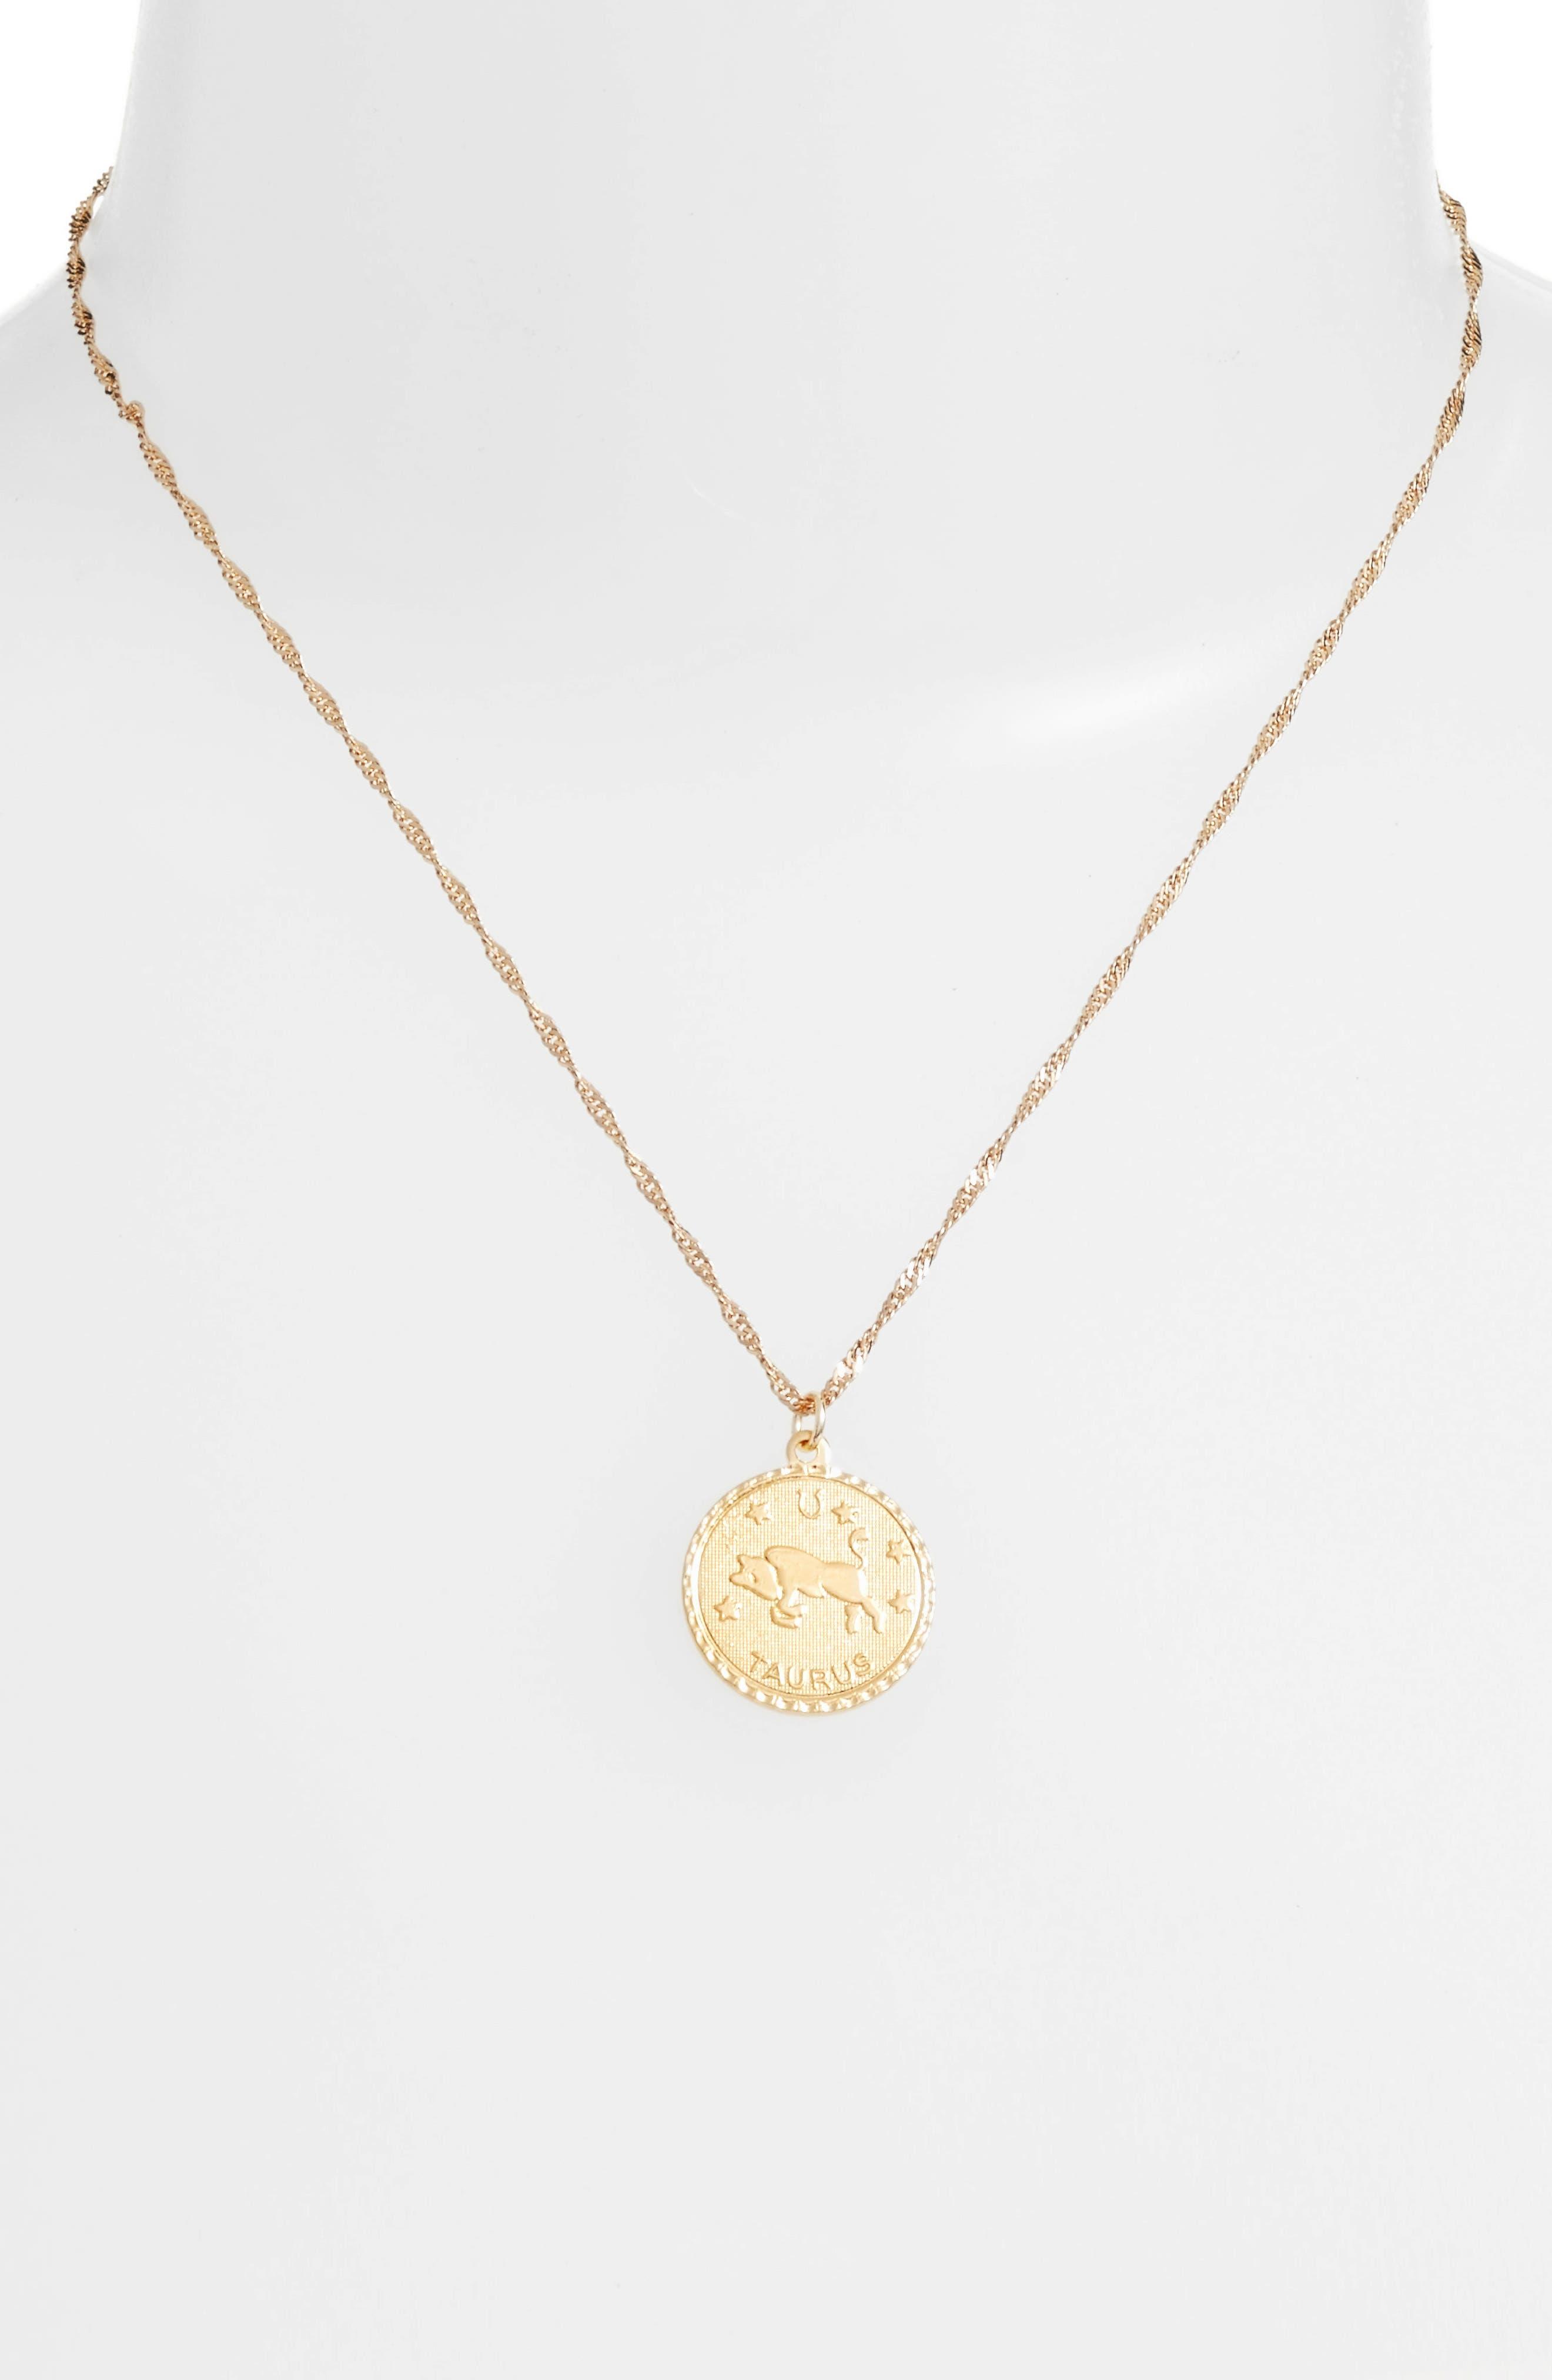 CAM, Jewelry Ascending Zodiac Medallion Necklace, Main thumbnail 1, color, TAURUS